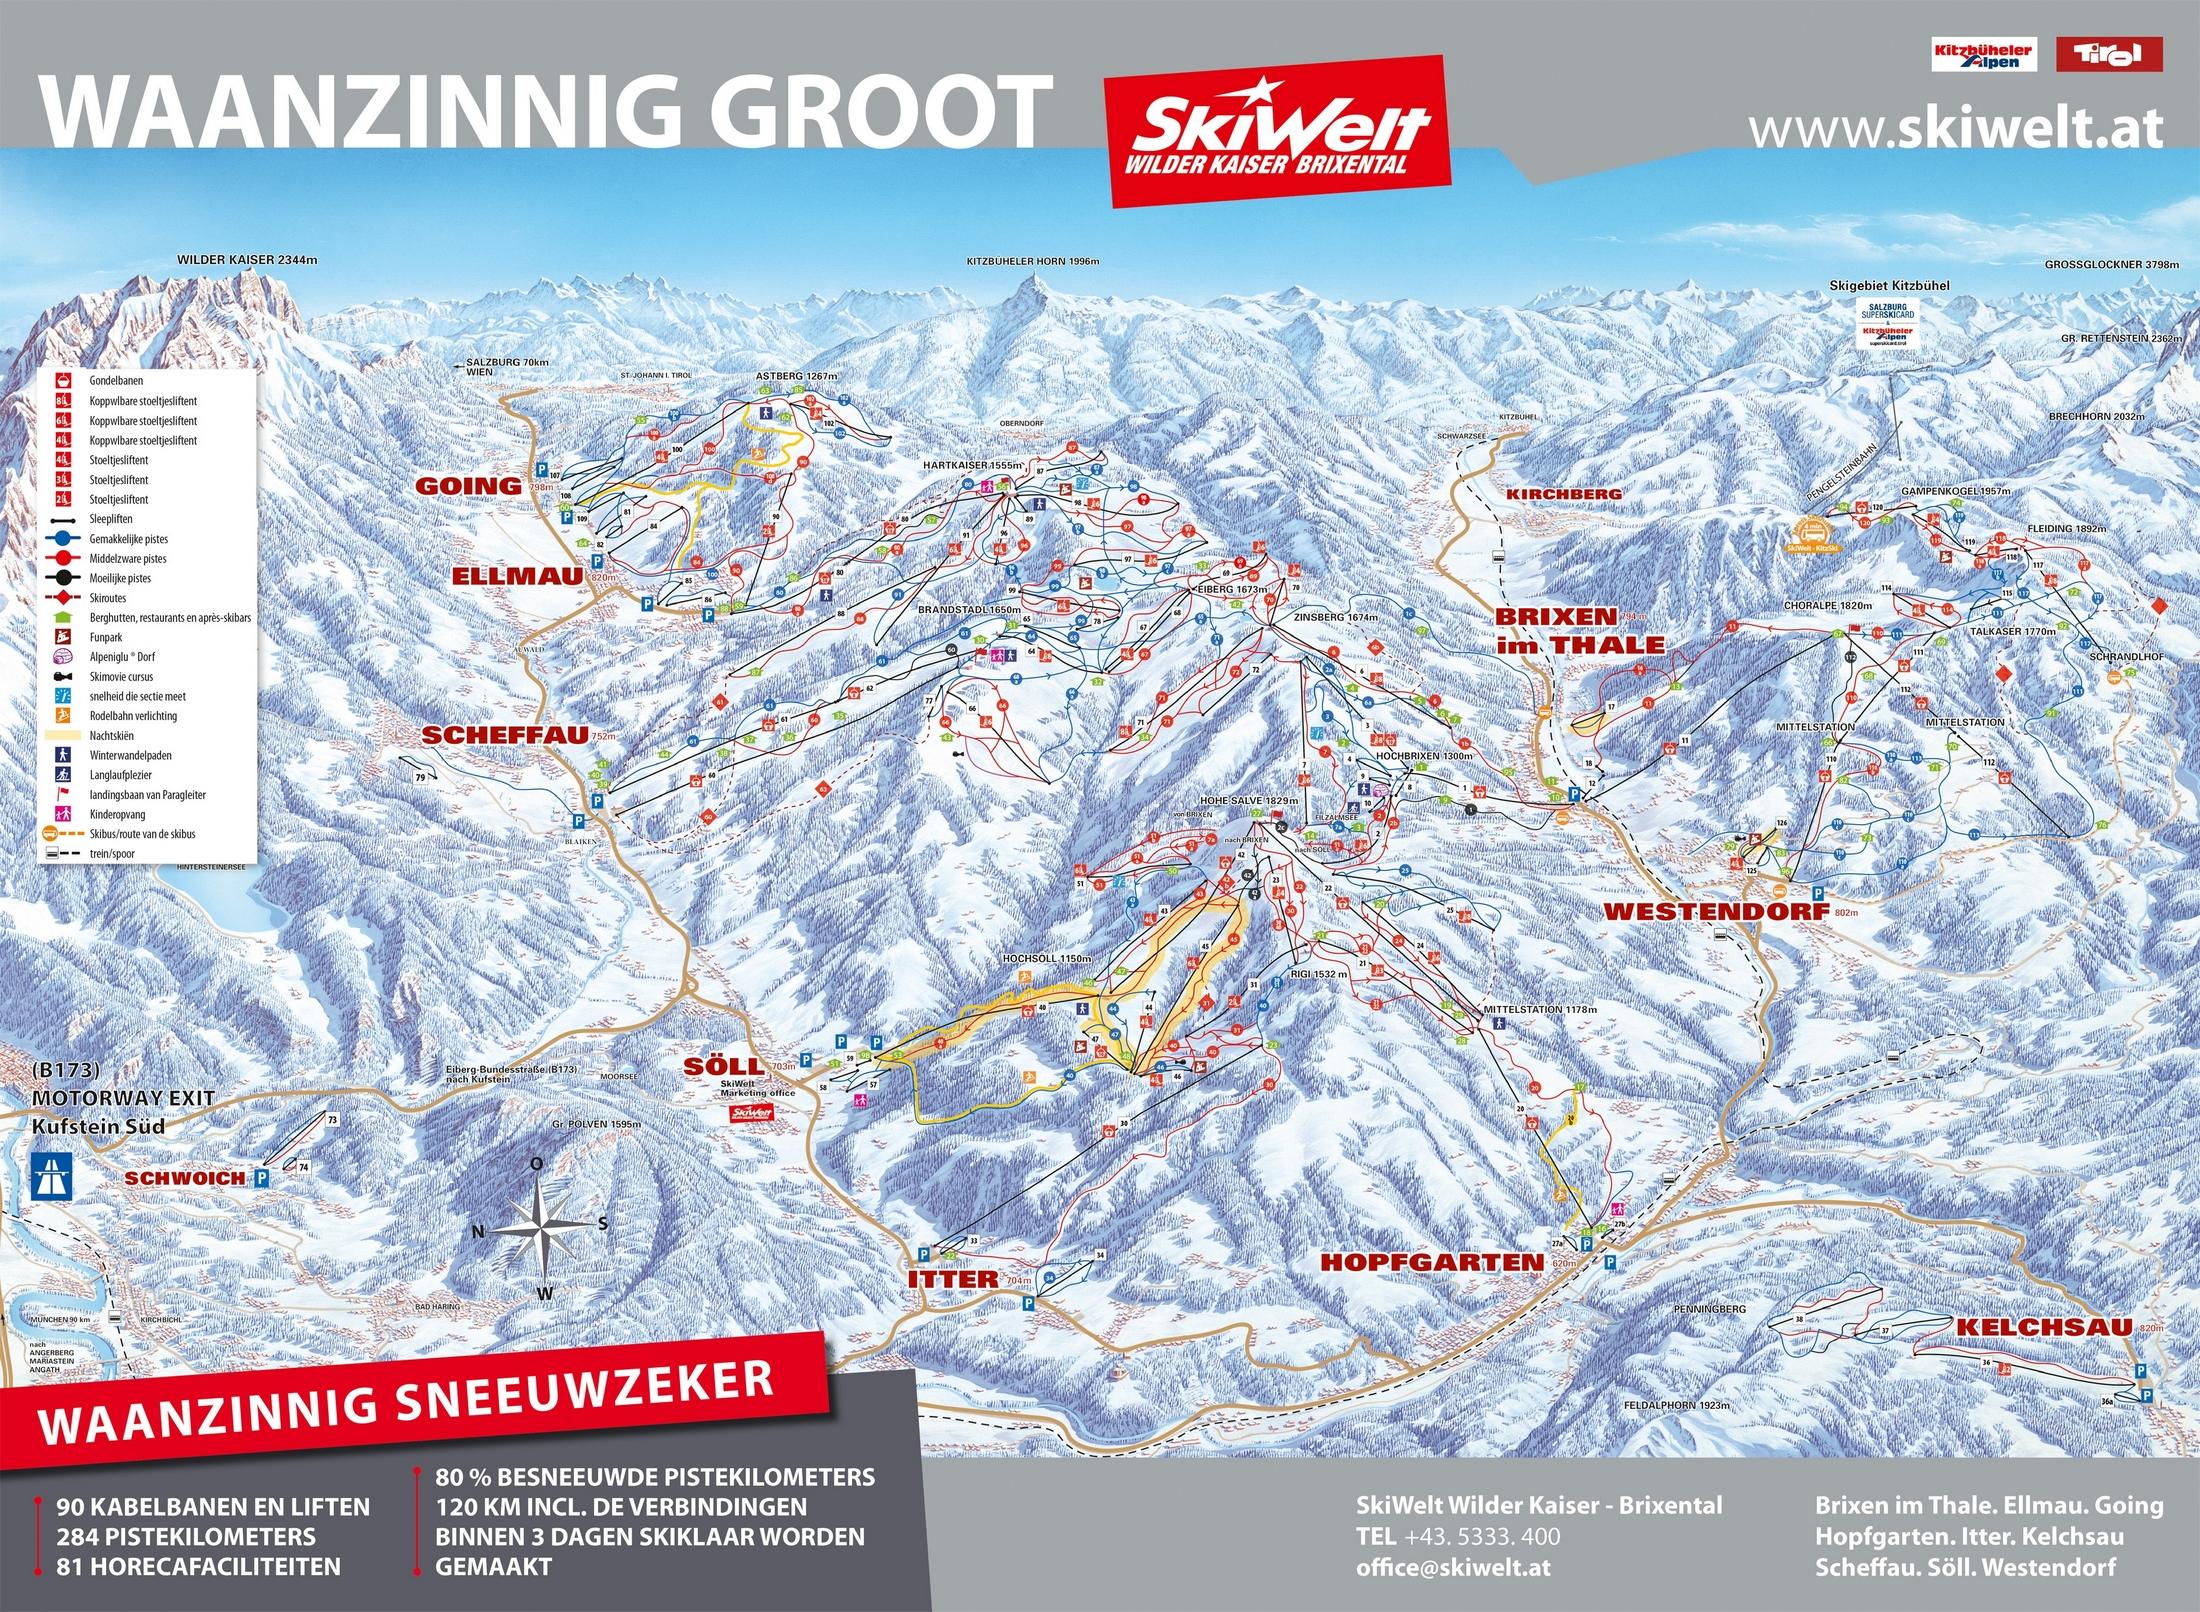 Pistkaart SkiWelt Wilderkaiser Brixental 2019/20